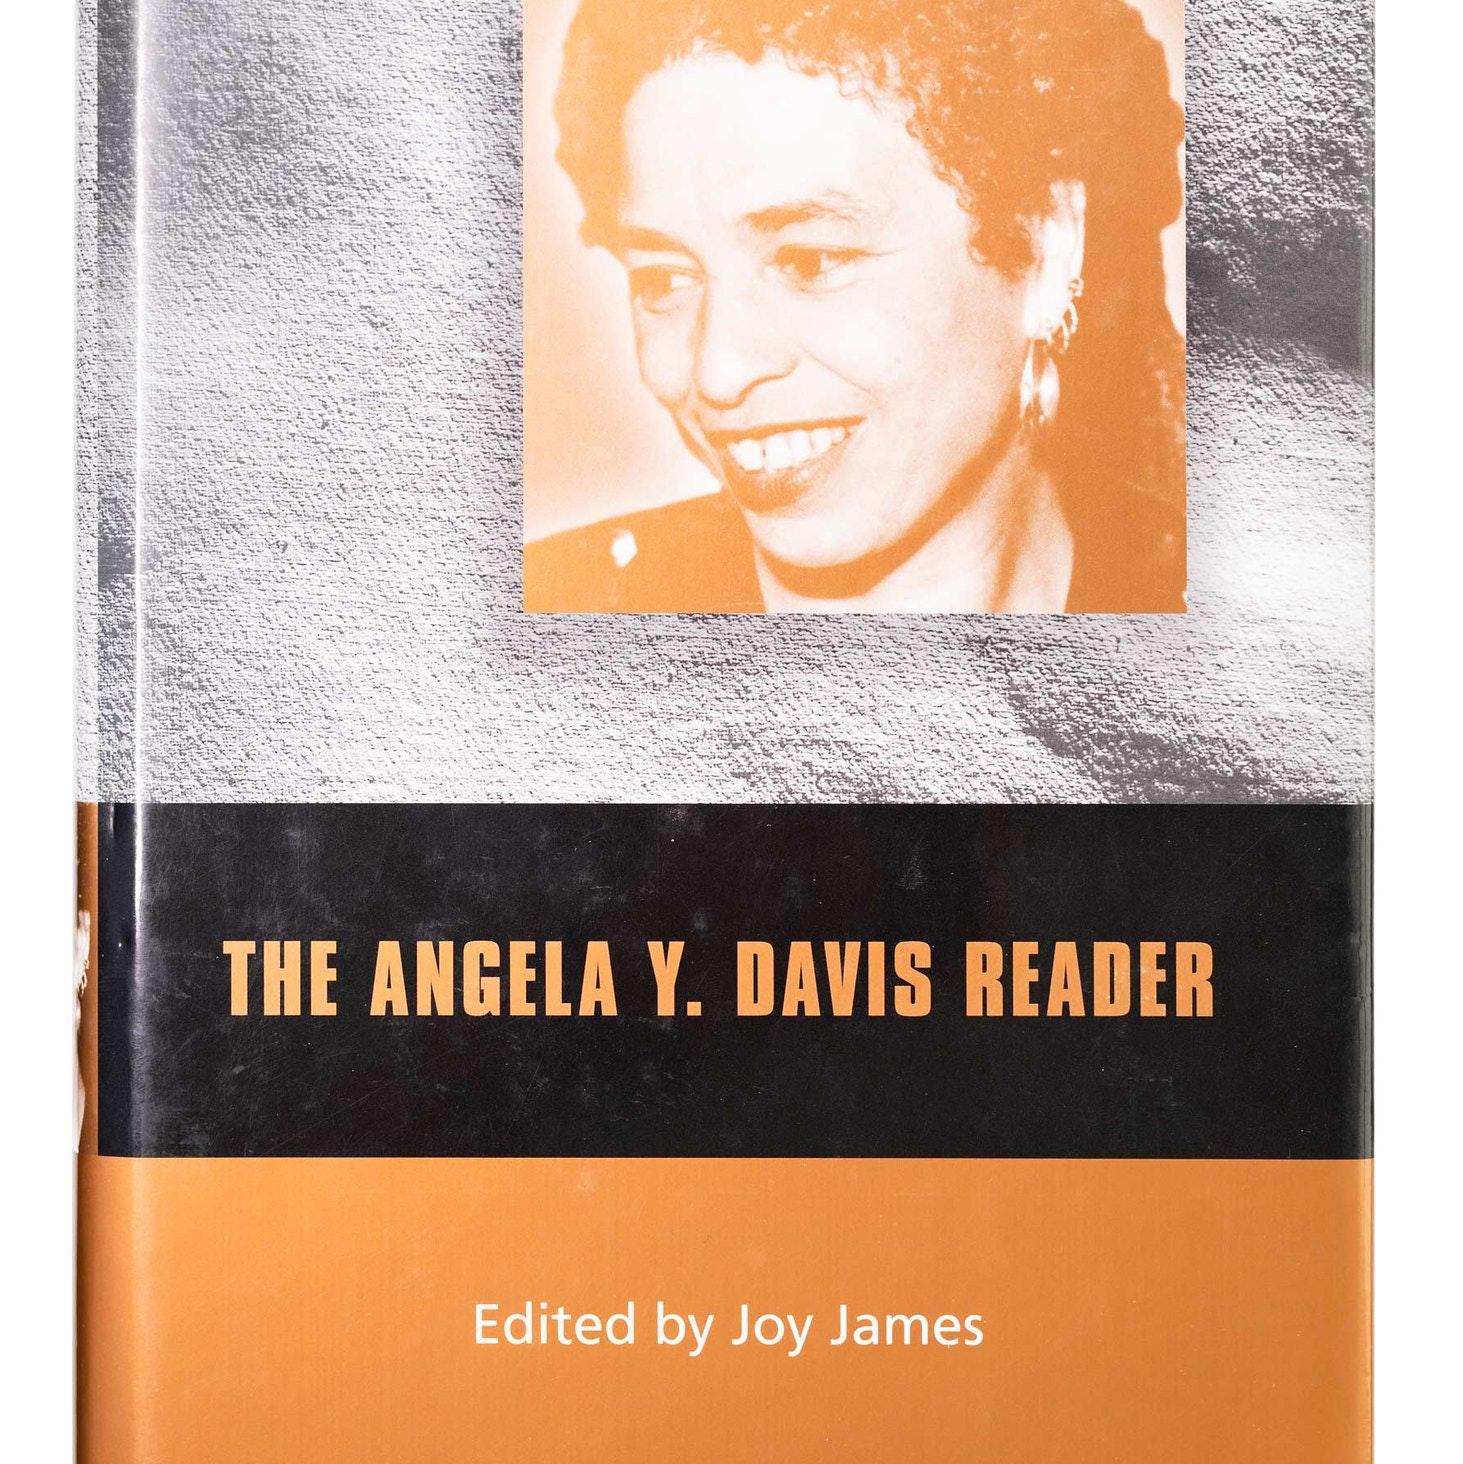 Angela Y. Davis Book cover with headshot of Davis tinted orange